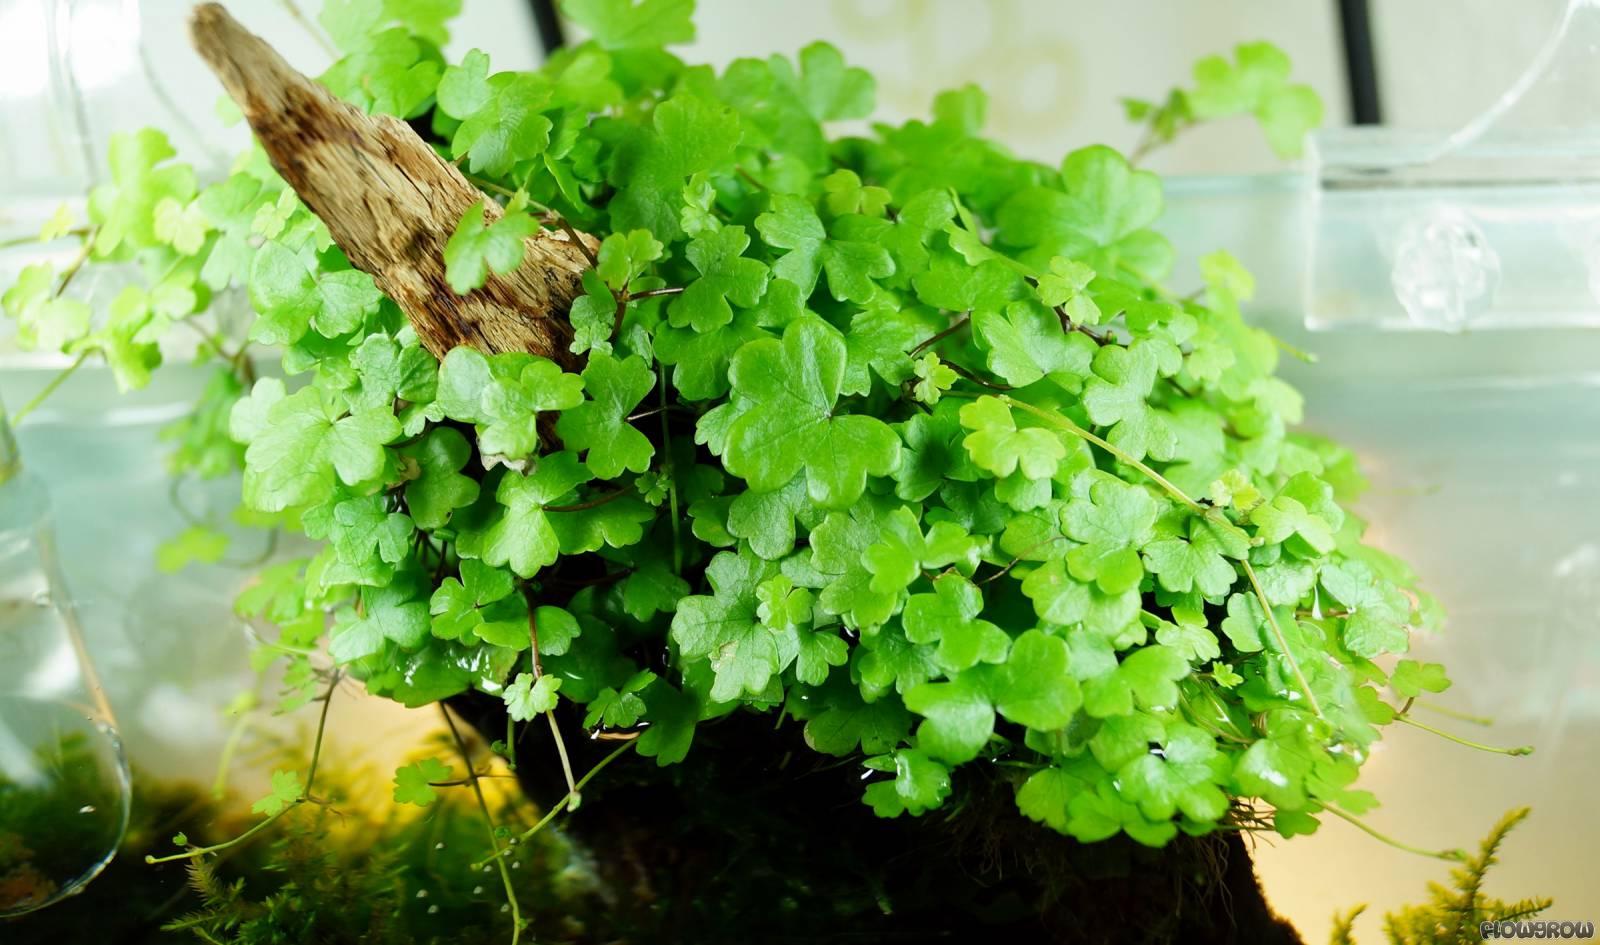 Hydrocotyle Cf Tripartita Flowgrow Aquatic Plant Database